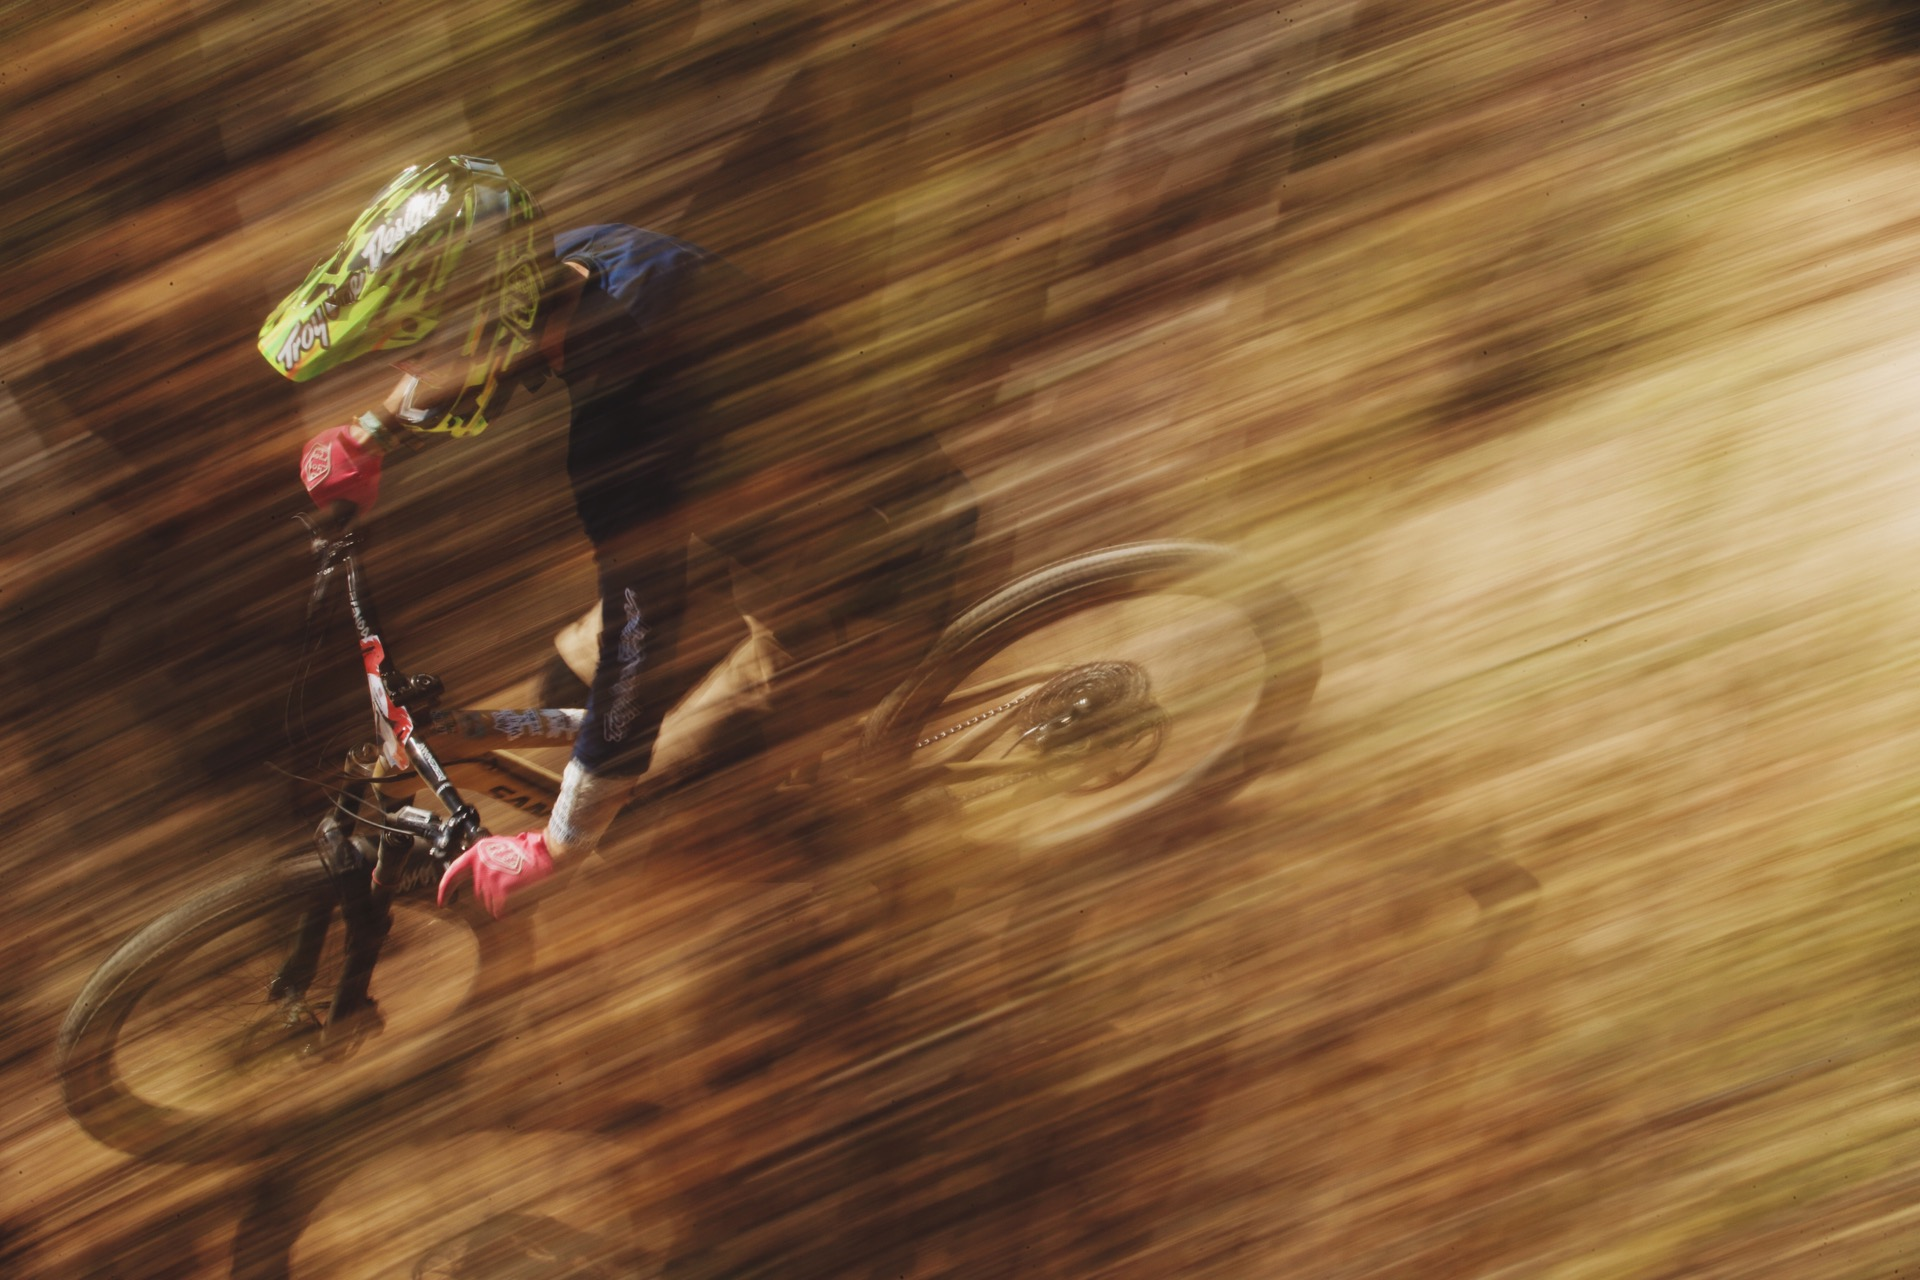 Santa Cruz Bicycles - Allan Cooke at Andes Pacifico Enduro 2018